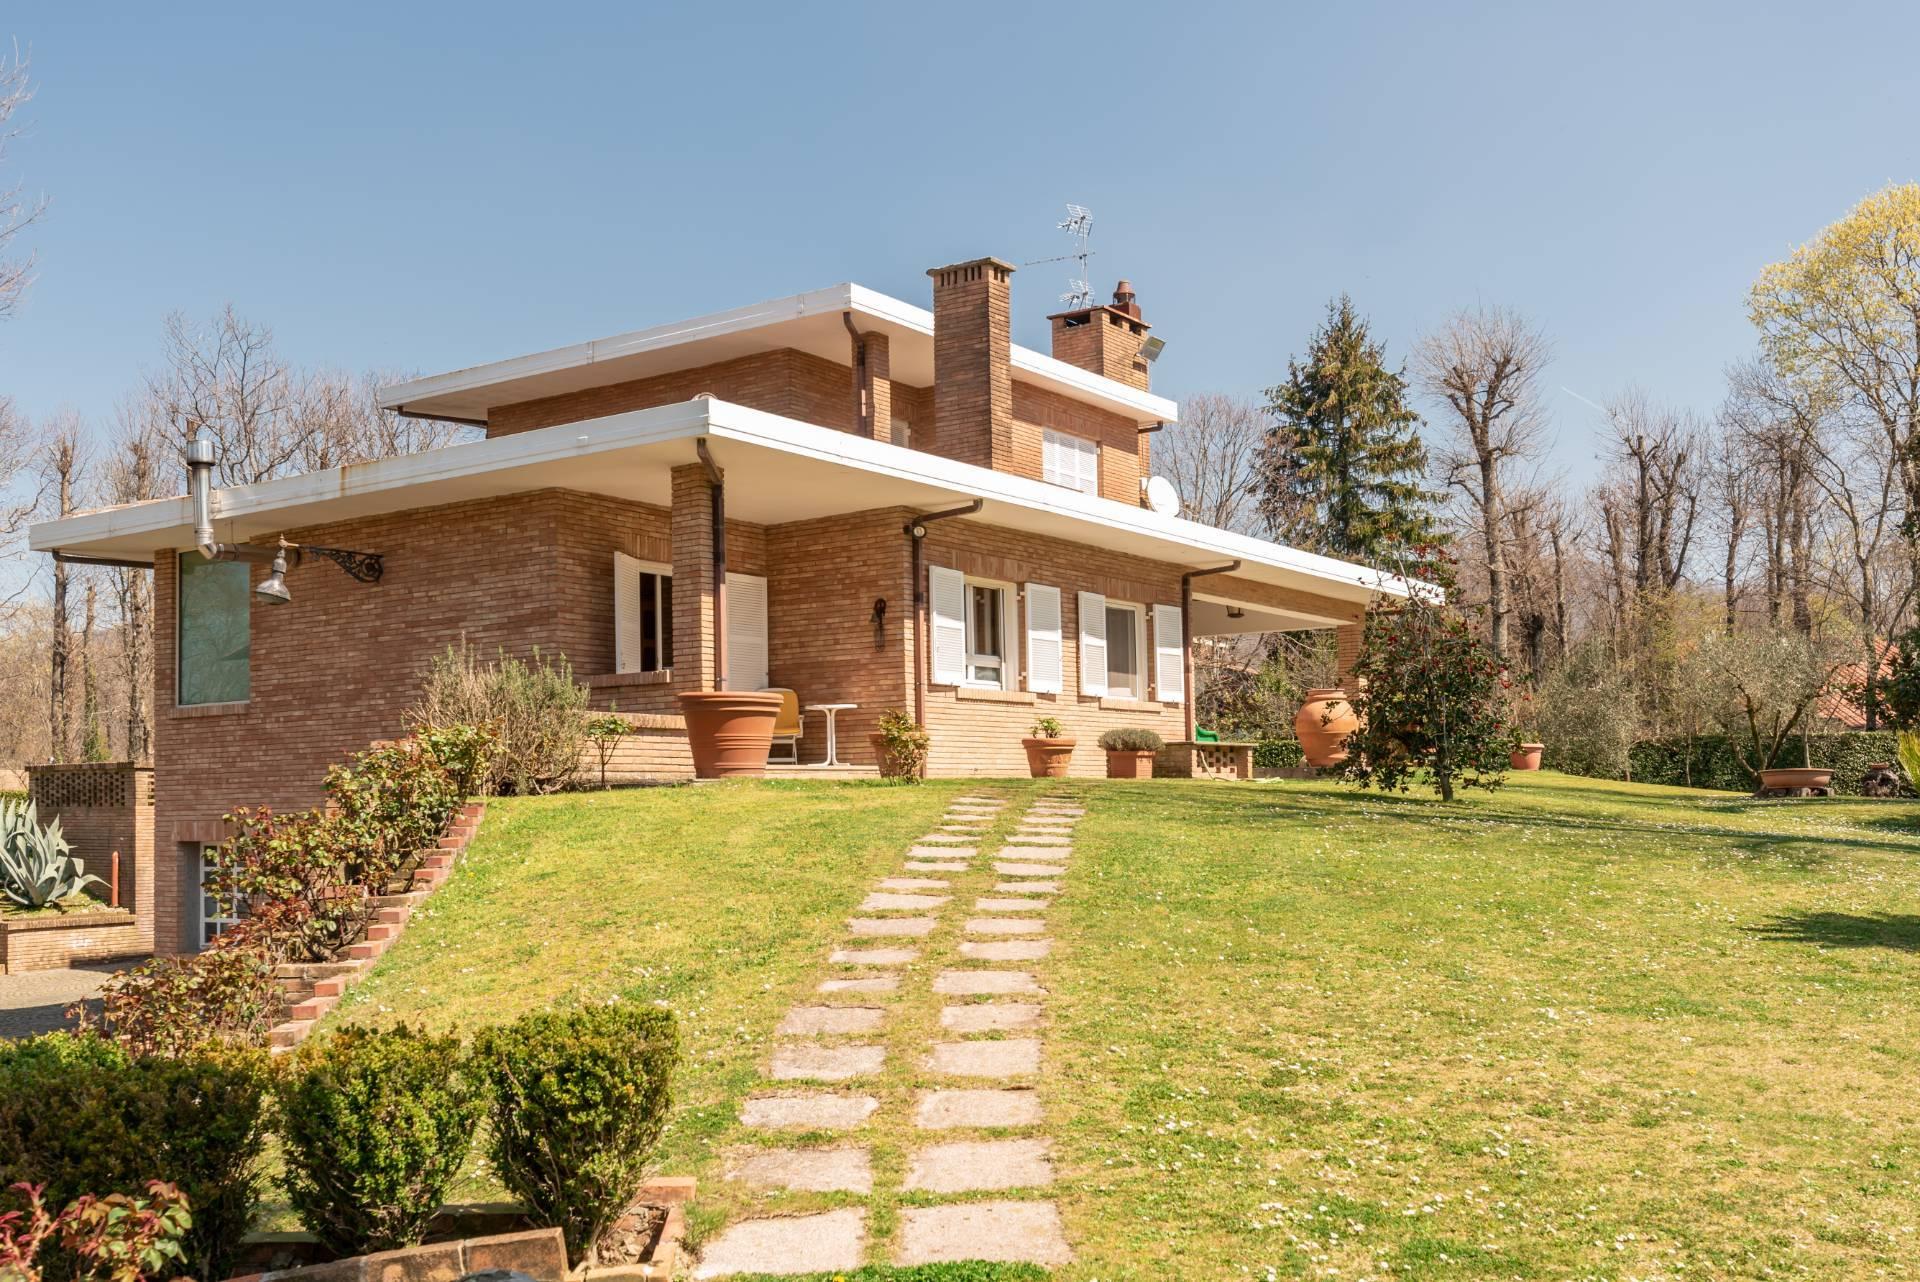 Villa in Vendita a Ariccia: 5 locali, 583 mq - Foto 12